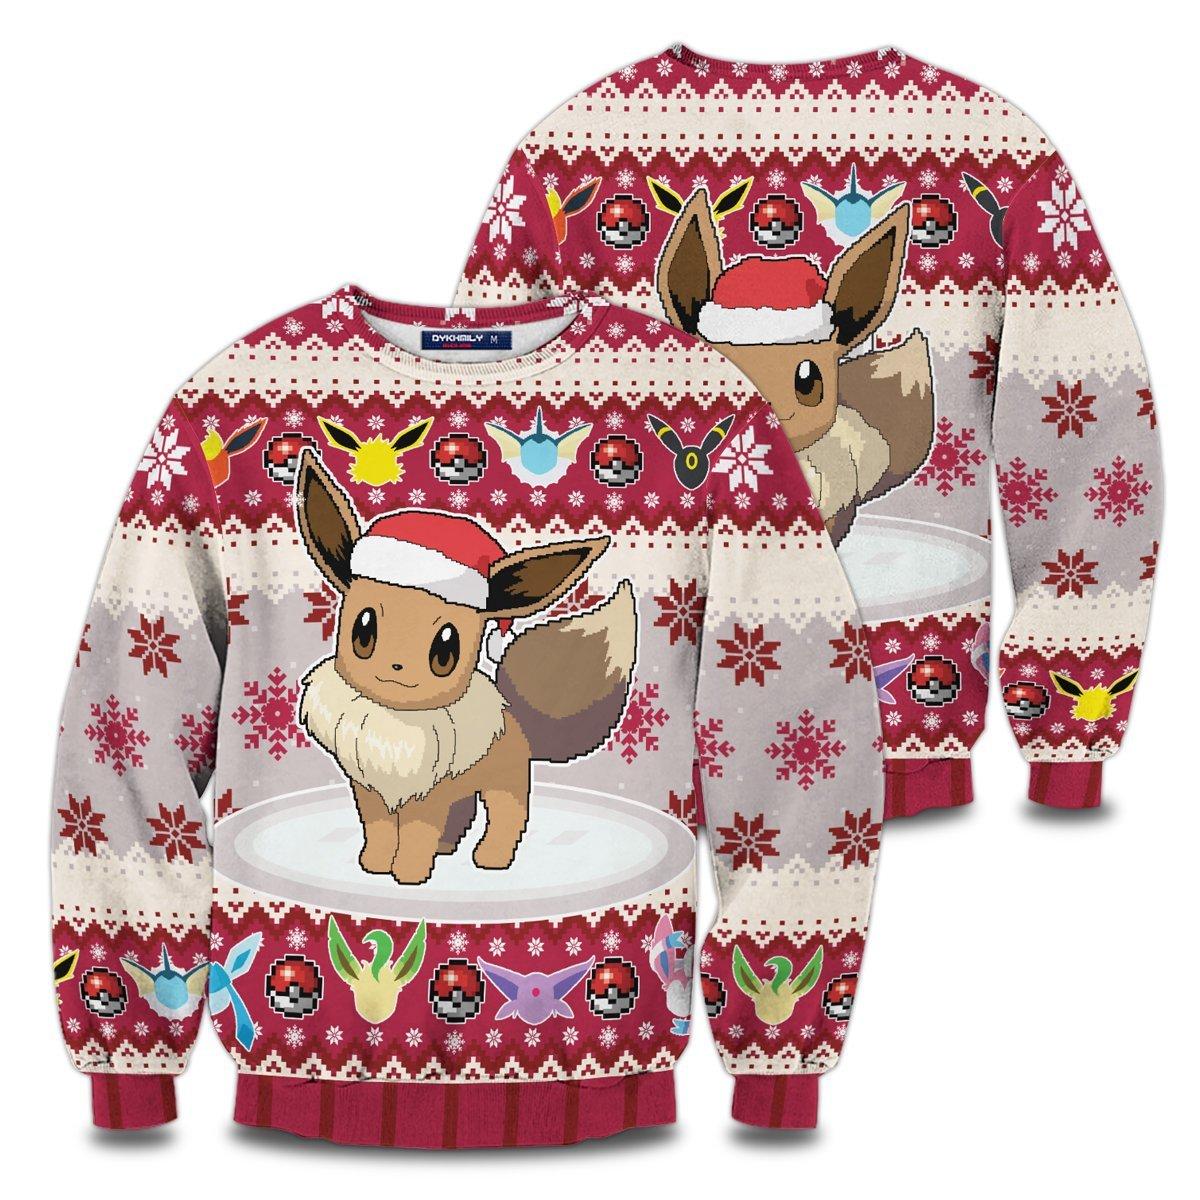 Christmas Eeveelution Unisex Wool Sweater FDM0310 S Official Otaku Treat Merch